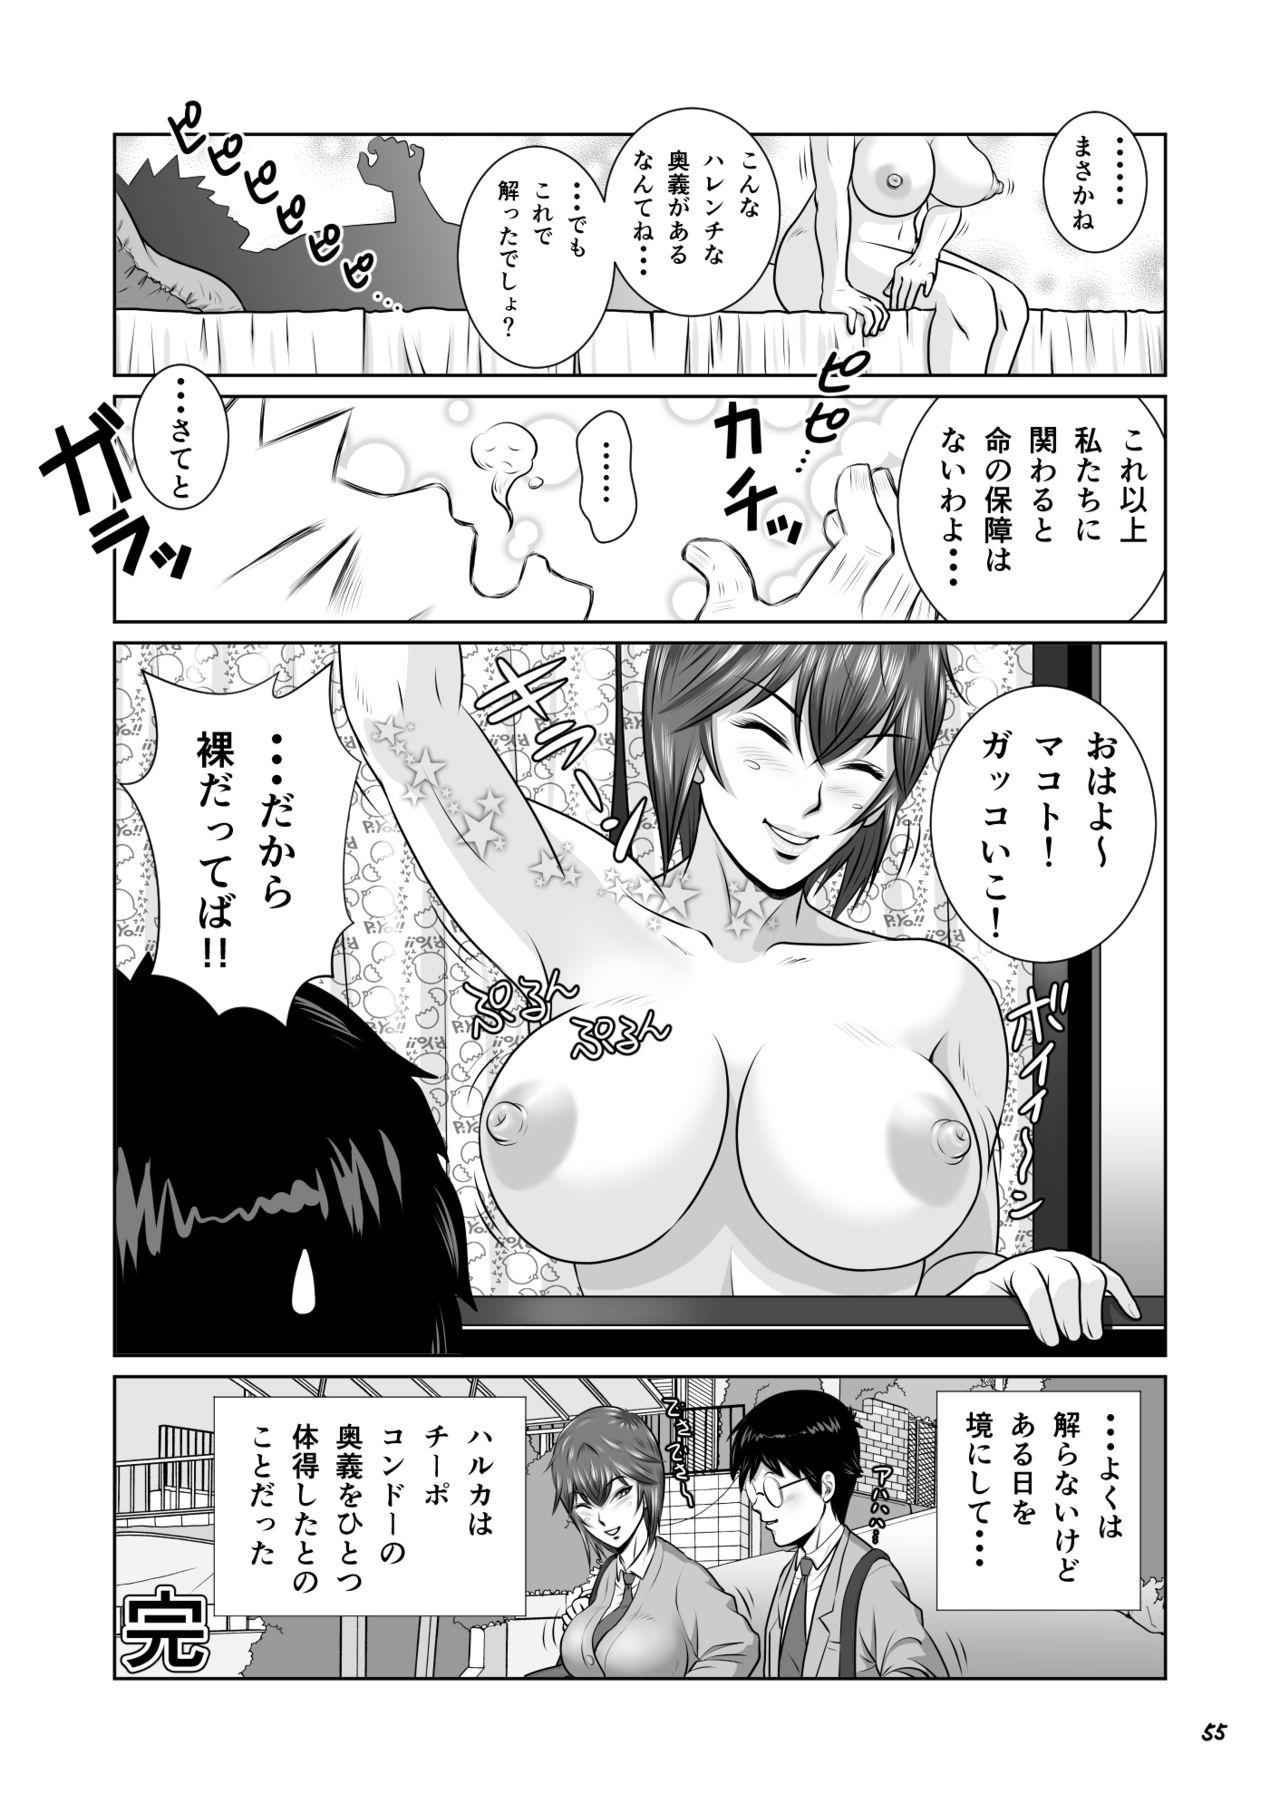 Netorare Osananajimi Haruka-chan Kiki Ippatsu!! 55